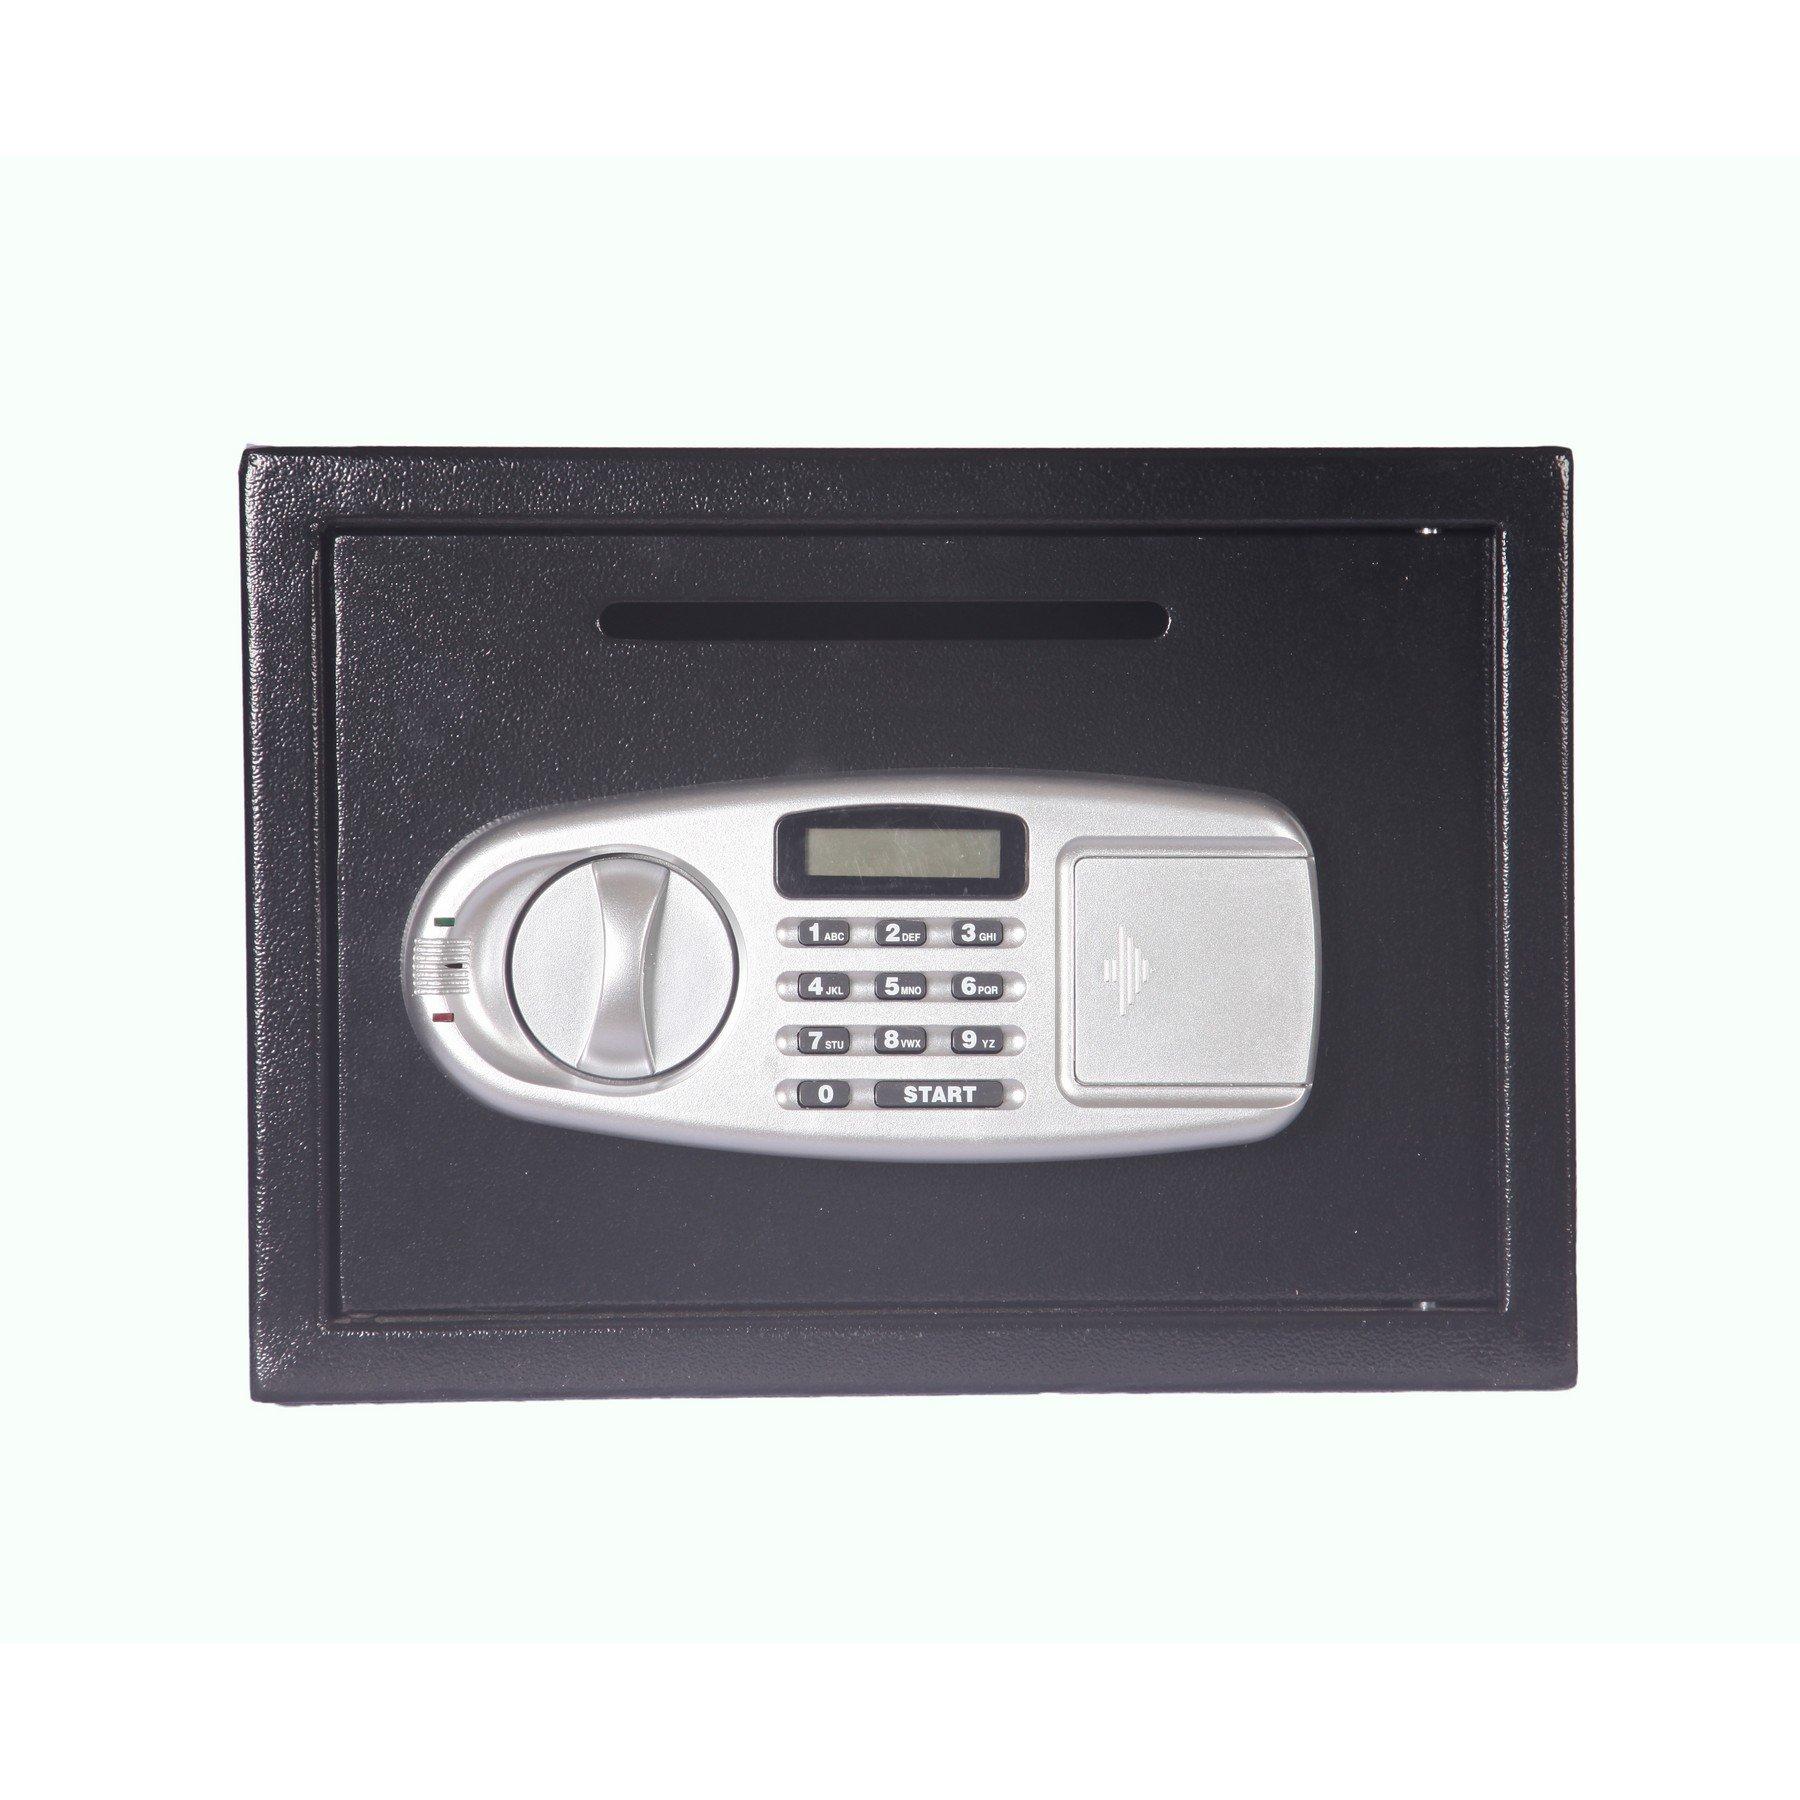 Hollon DP25EL Drop Slot Safe with Electronic Lock